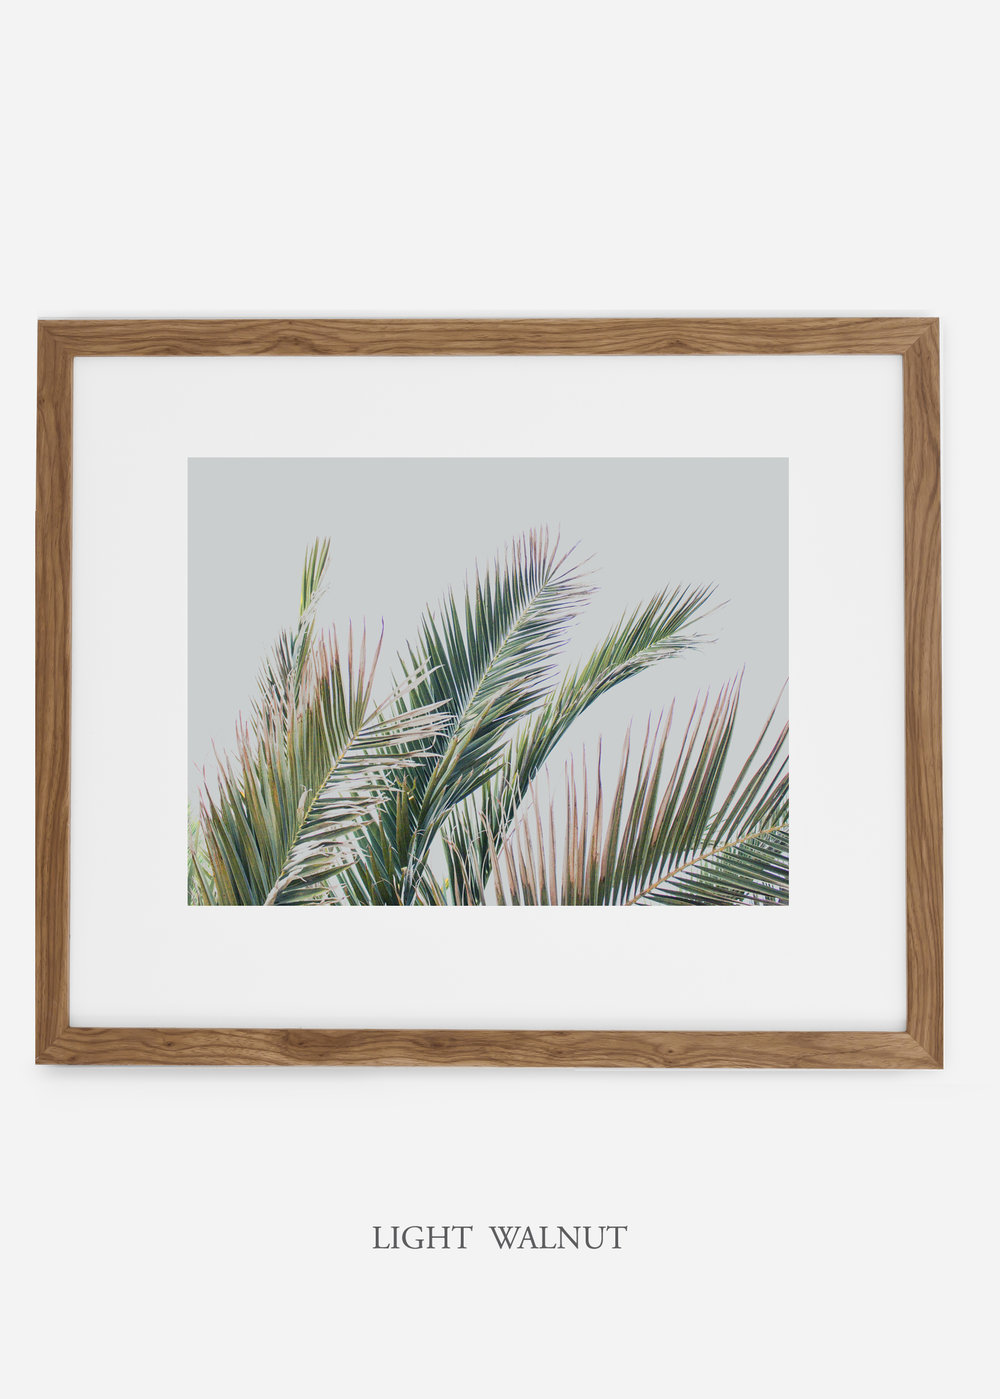 interiordesign_lightwalnutframe_art_tropical_palmtree_StormyGrayPalm.jpg